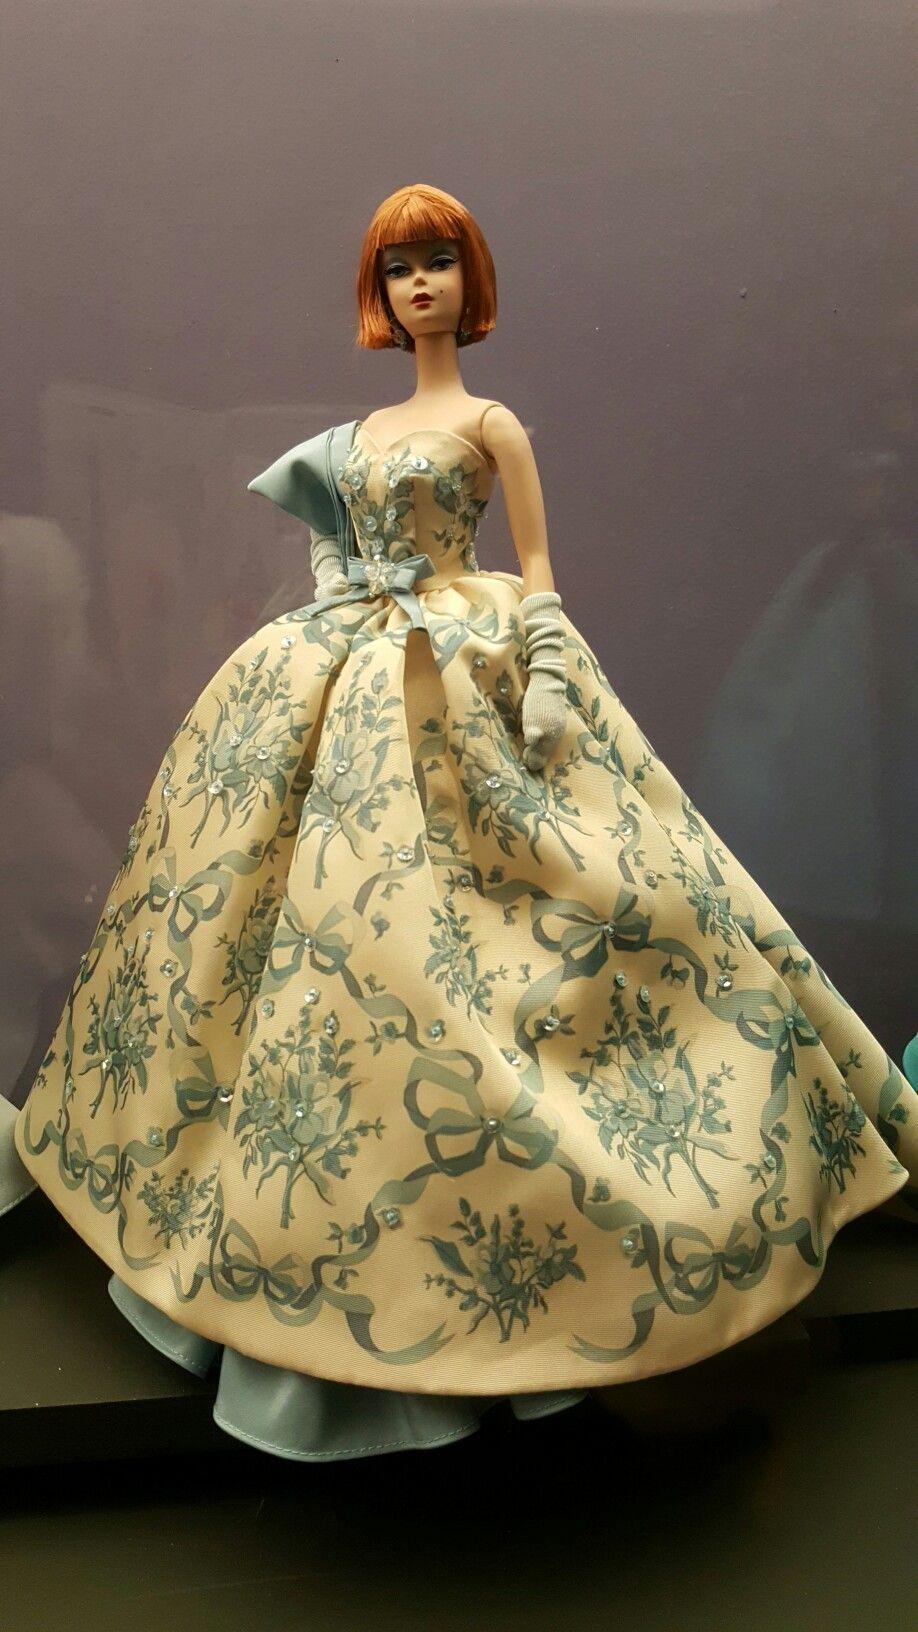 Pin von KaraKolle auf Barbie Rêve de bal 9 (cristal) | Pinterest ...